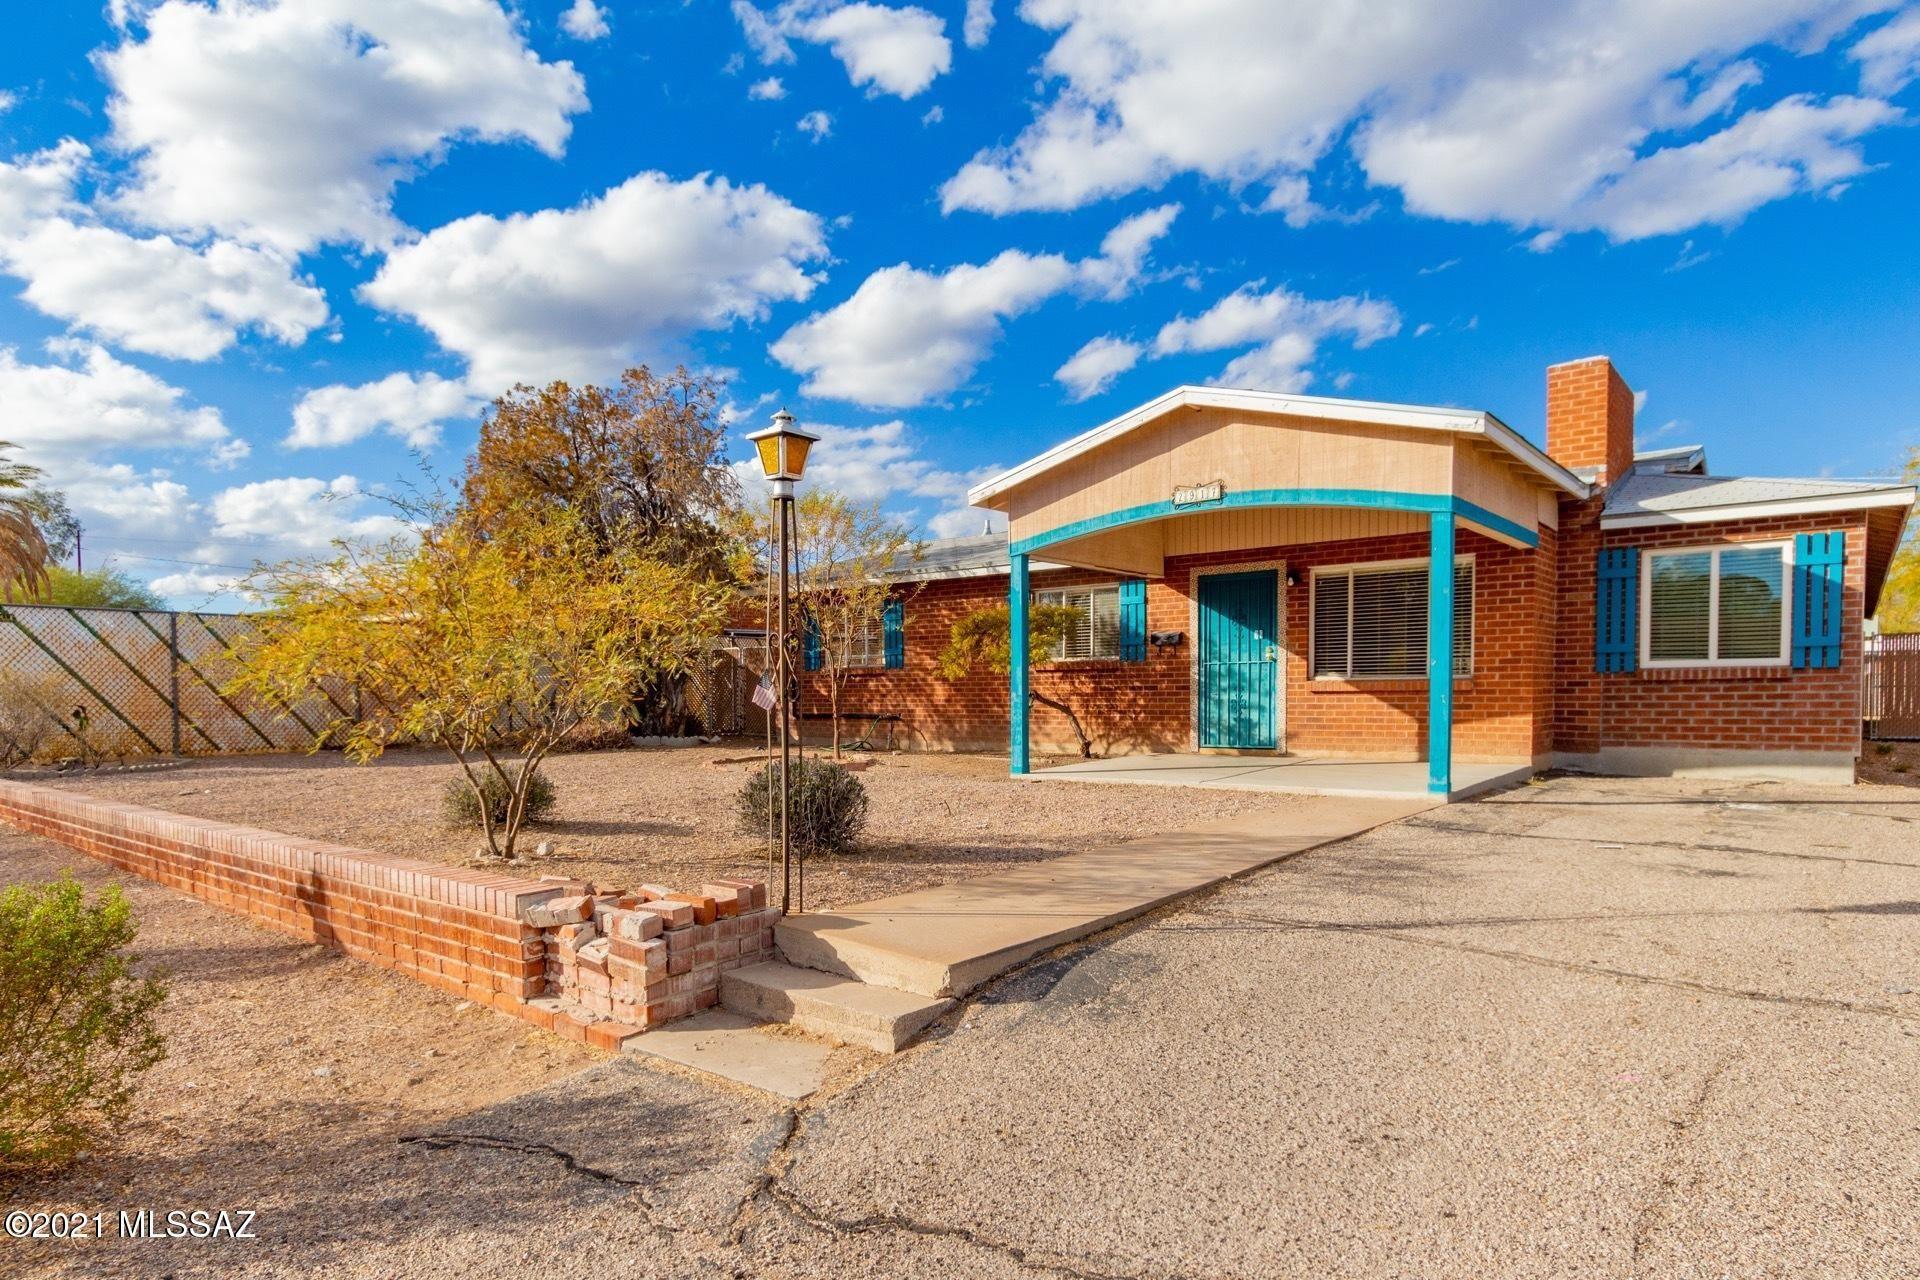 2917 E Seneca Street, Tucson, AZ 85716 - MLS#: 22028277